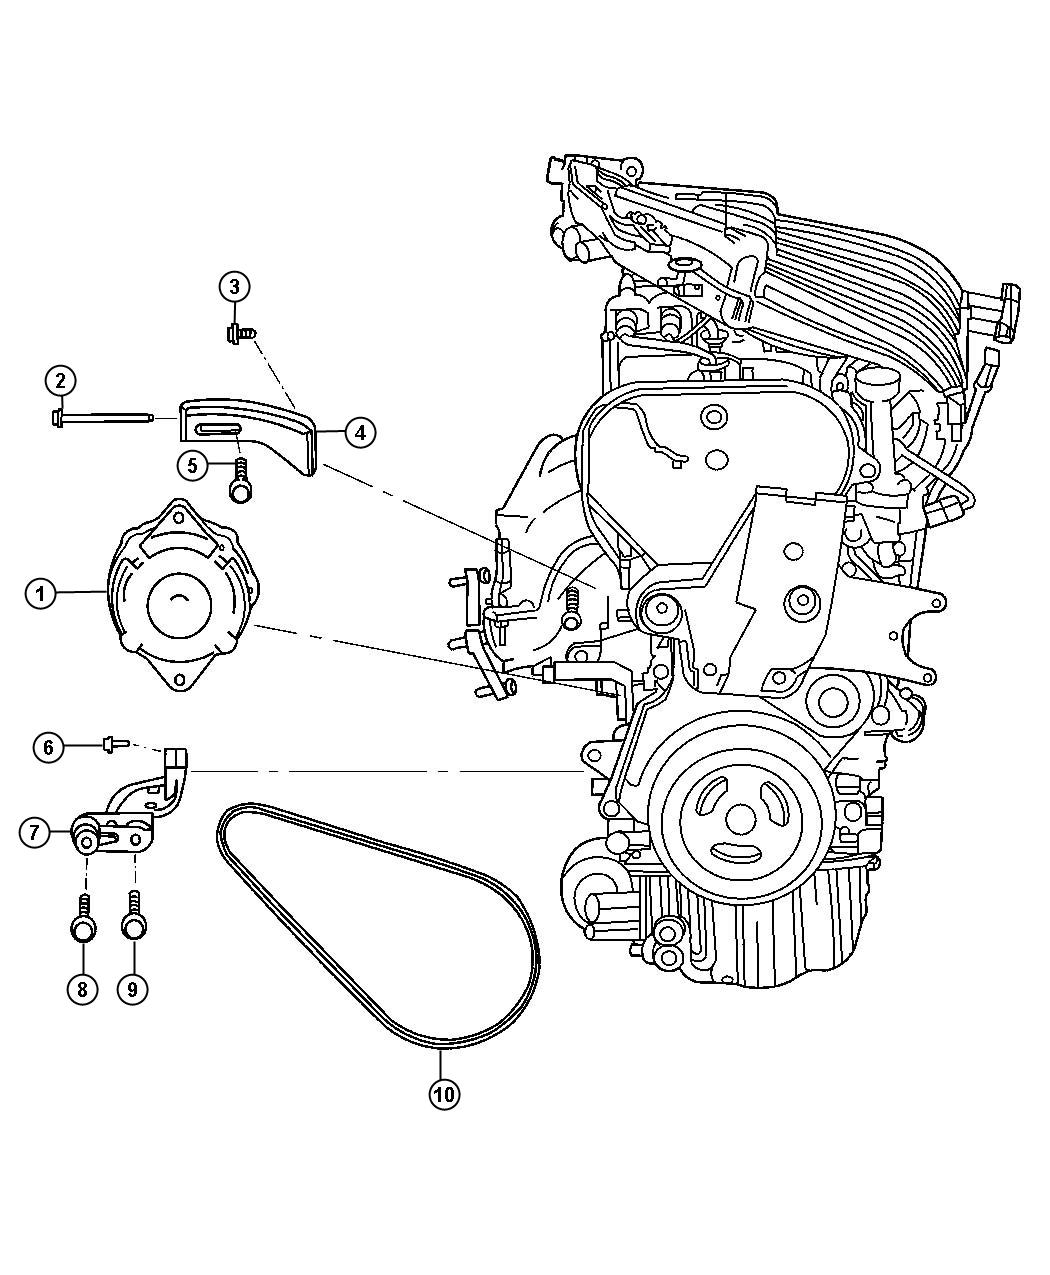 Dodge Neon Generator. Remanufactured. Engine. [alternator